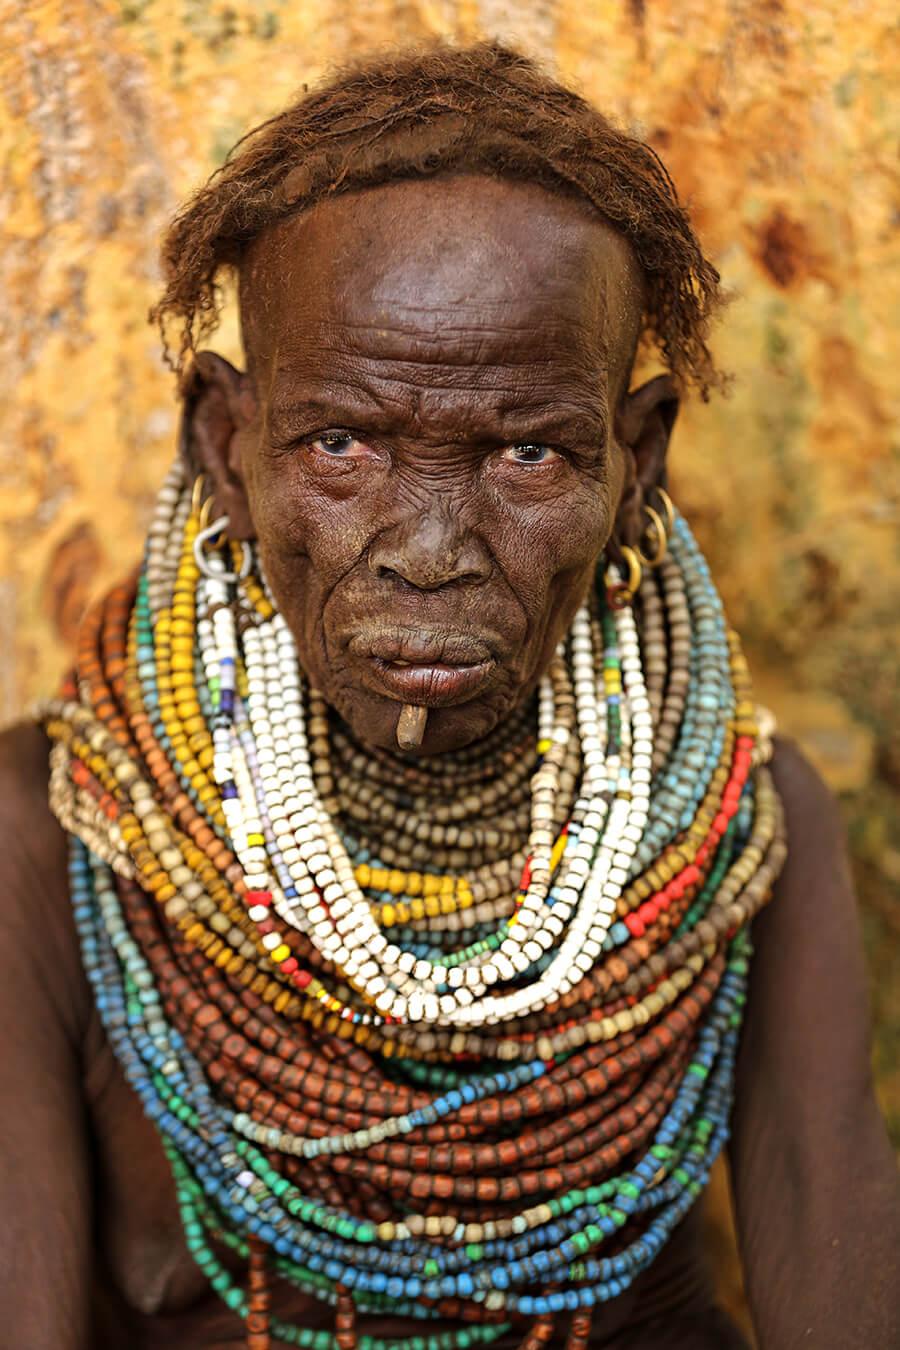 Женщина из племени Ньянгатом. Граница Эфиопии и Южного Судана. © Александр Химушин / The World In Faces